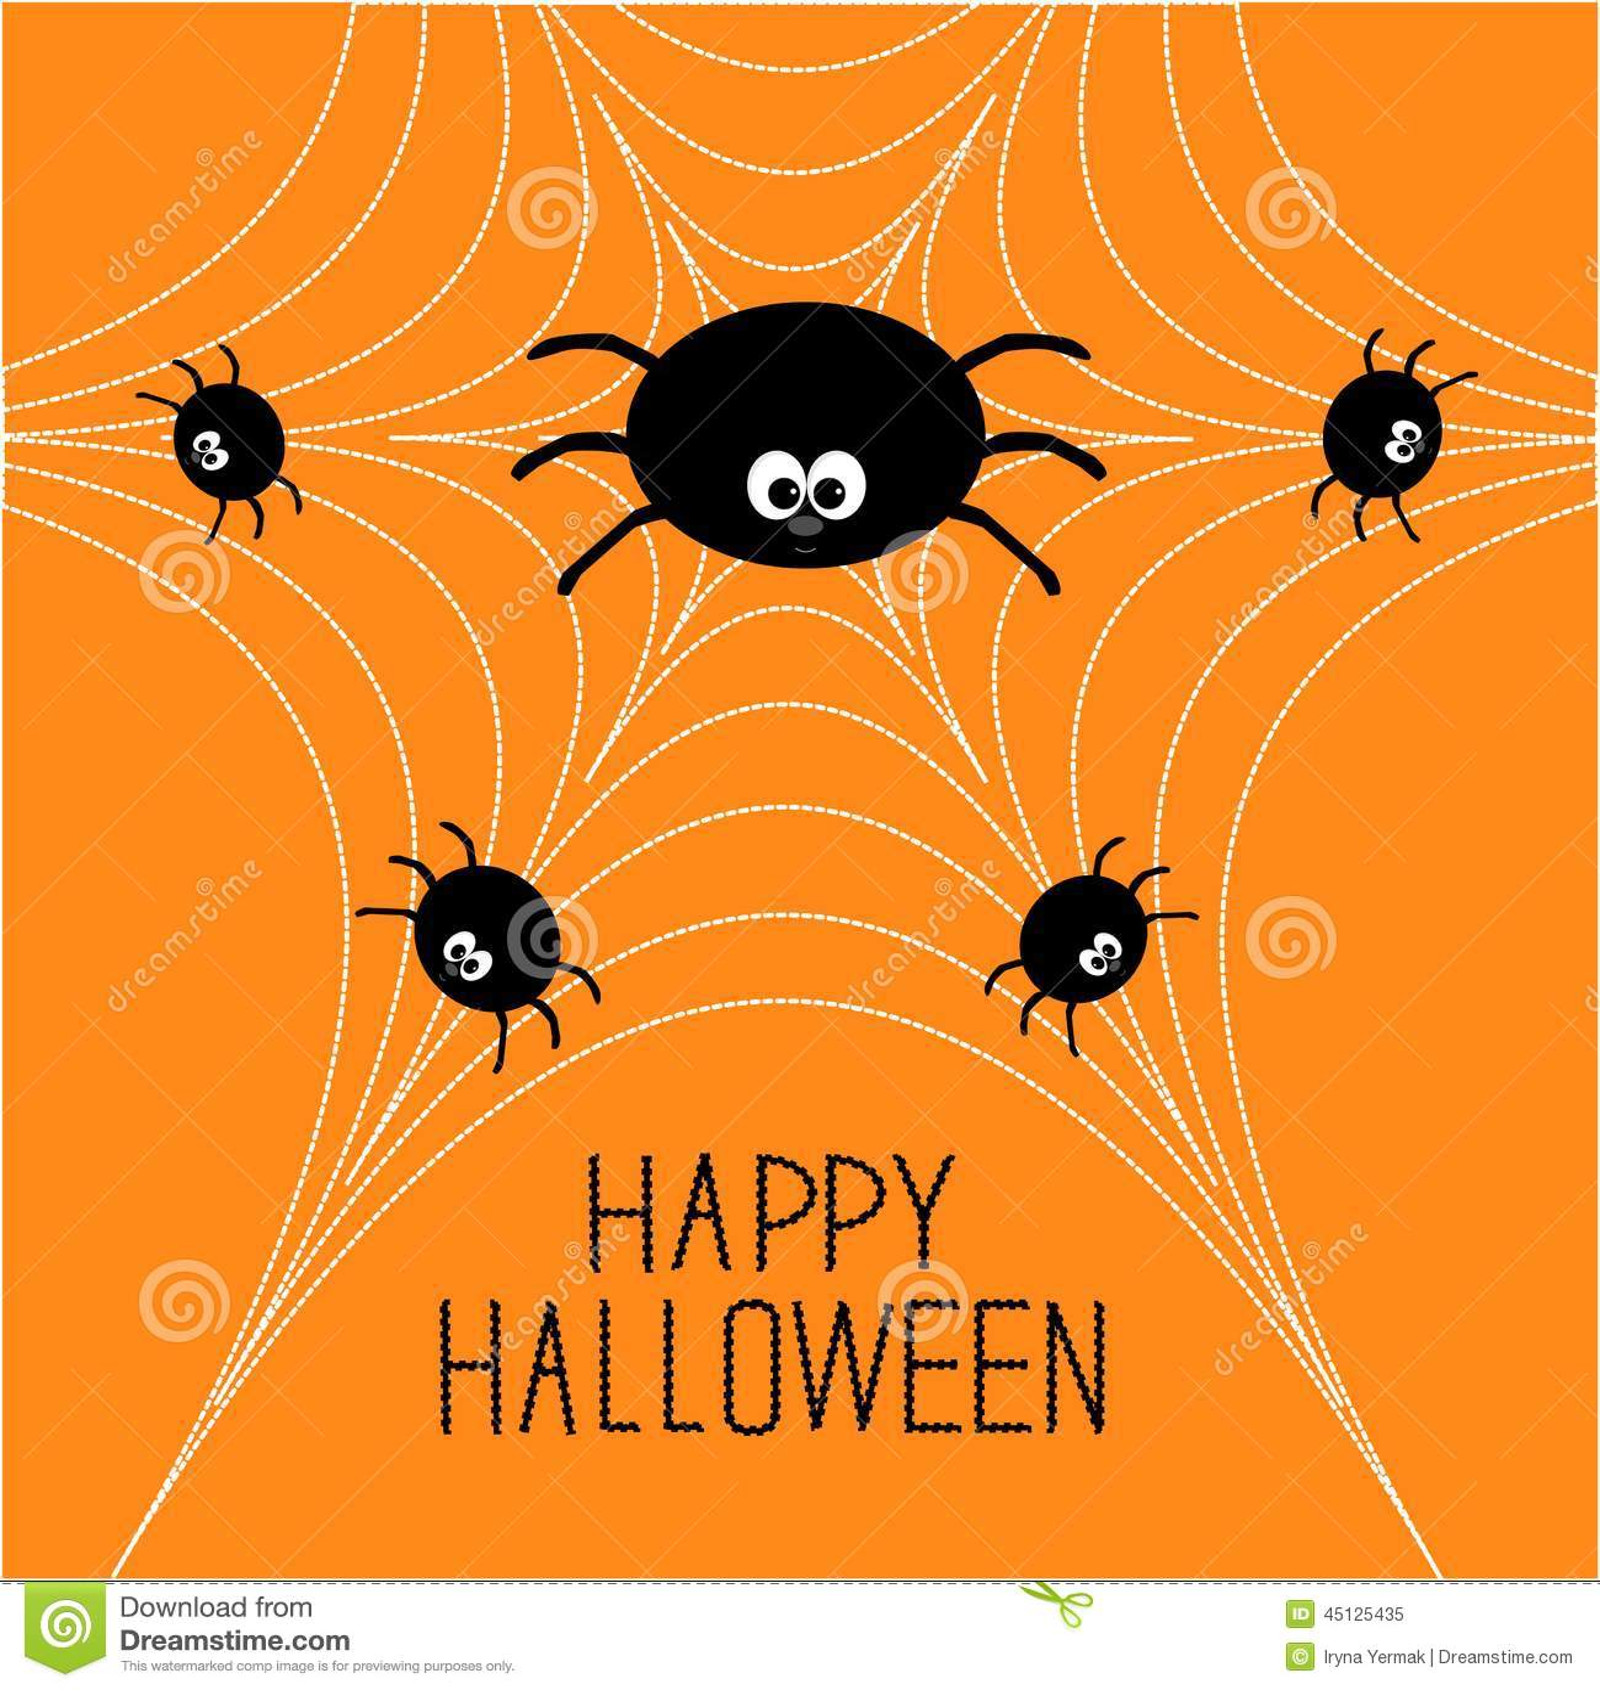 Vector Illustration Web Designs: Cute Cartoon Spider Family On The Web. Halloween Card